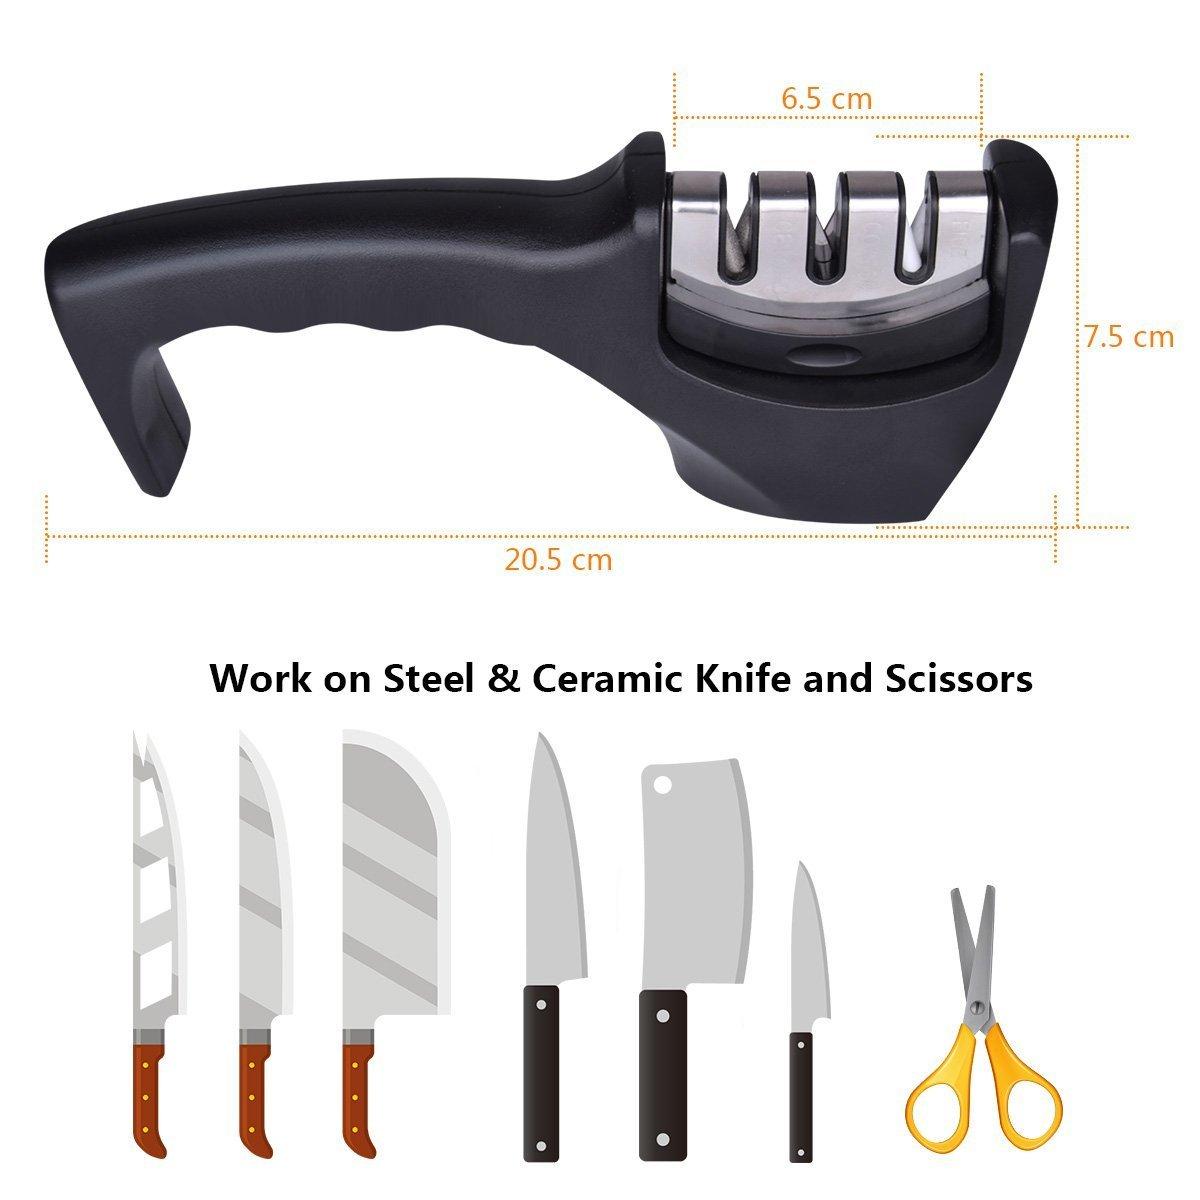 Amazon.com: Afilador de cuchillo de cocina. Afilador de ...